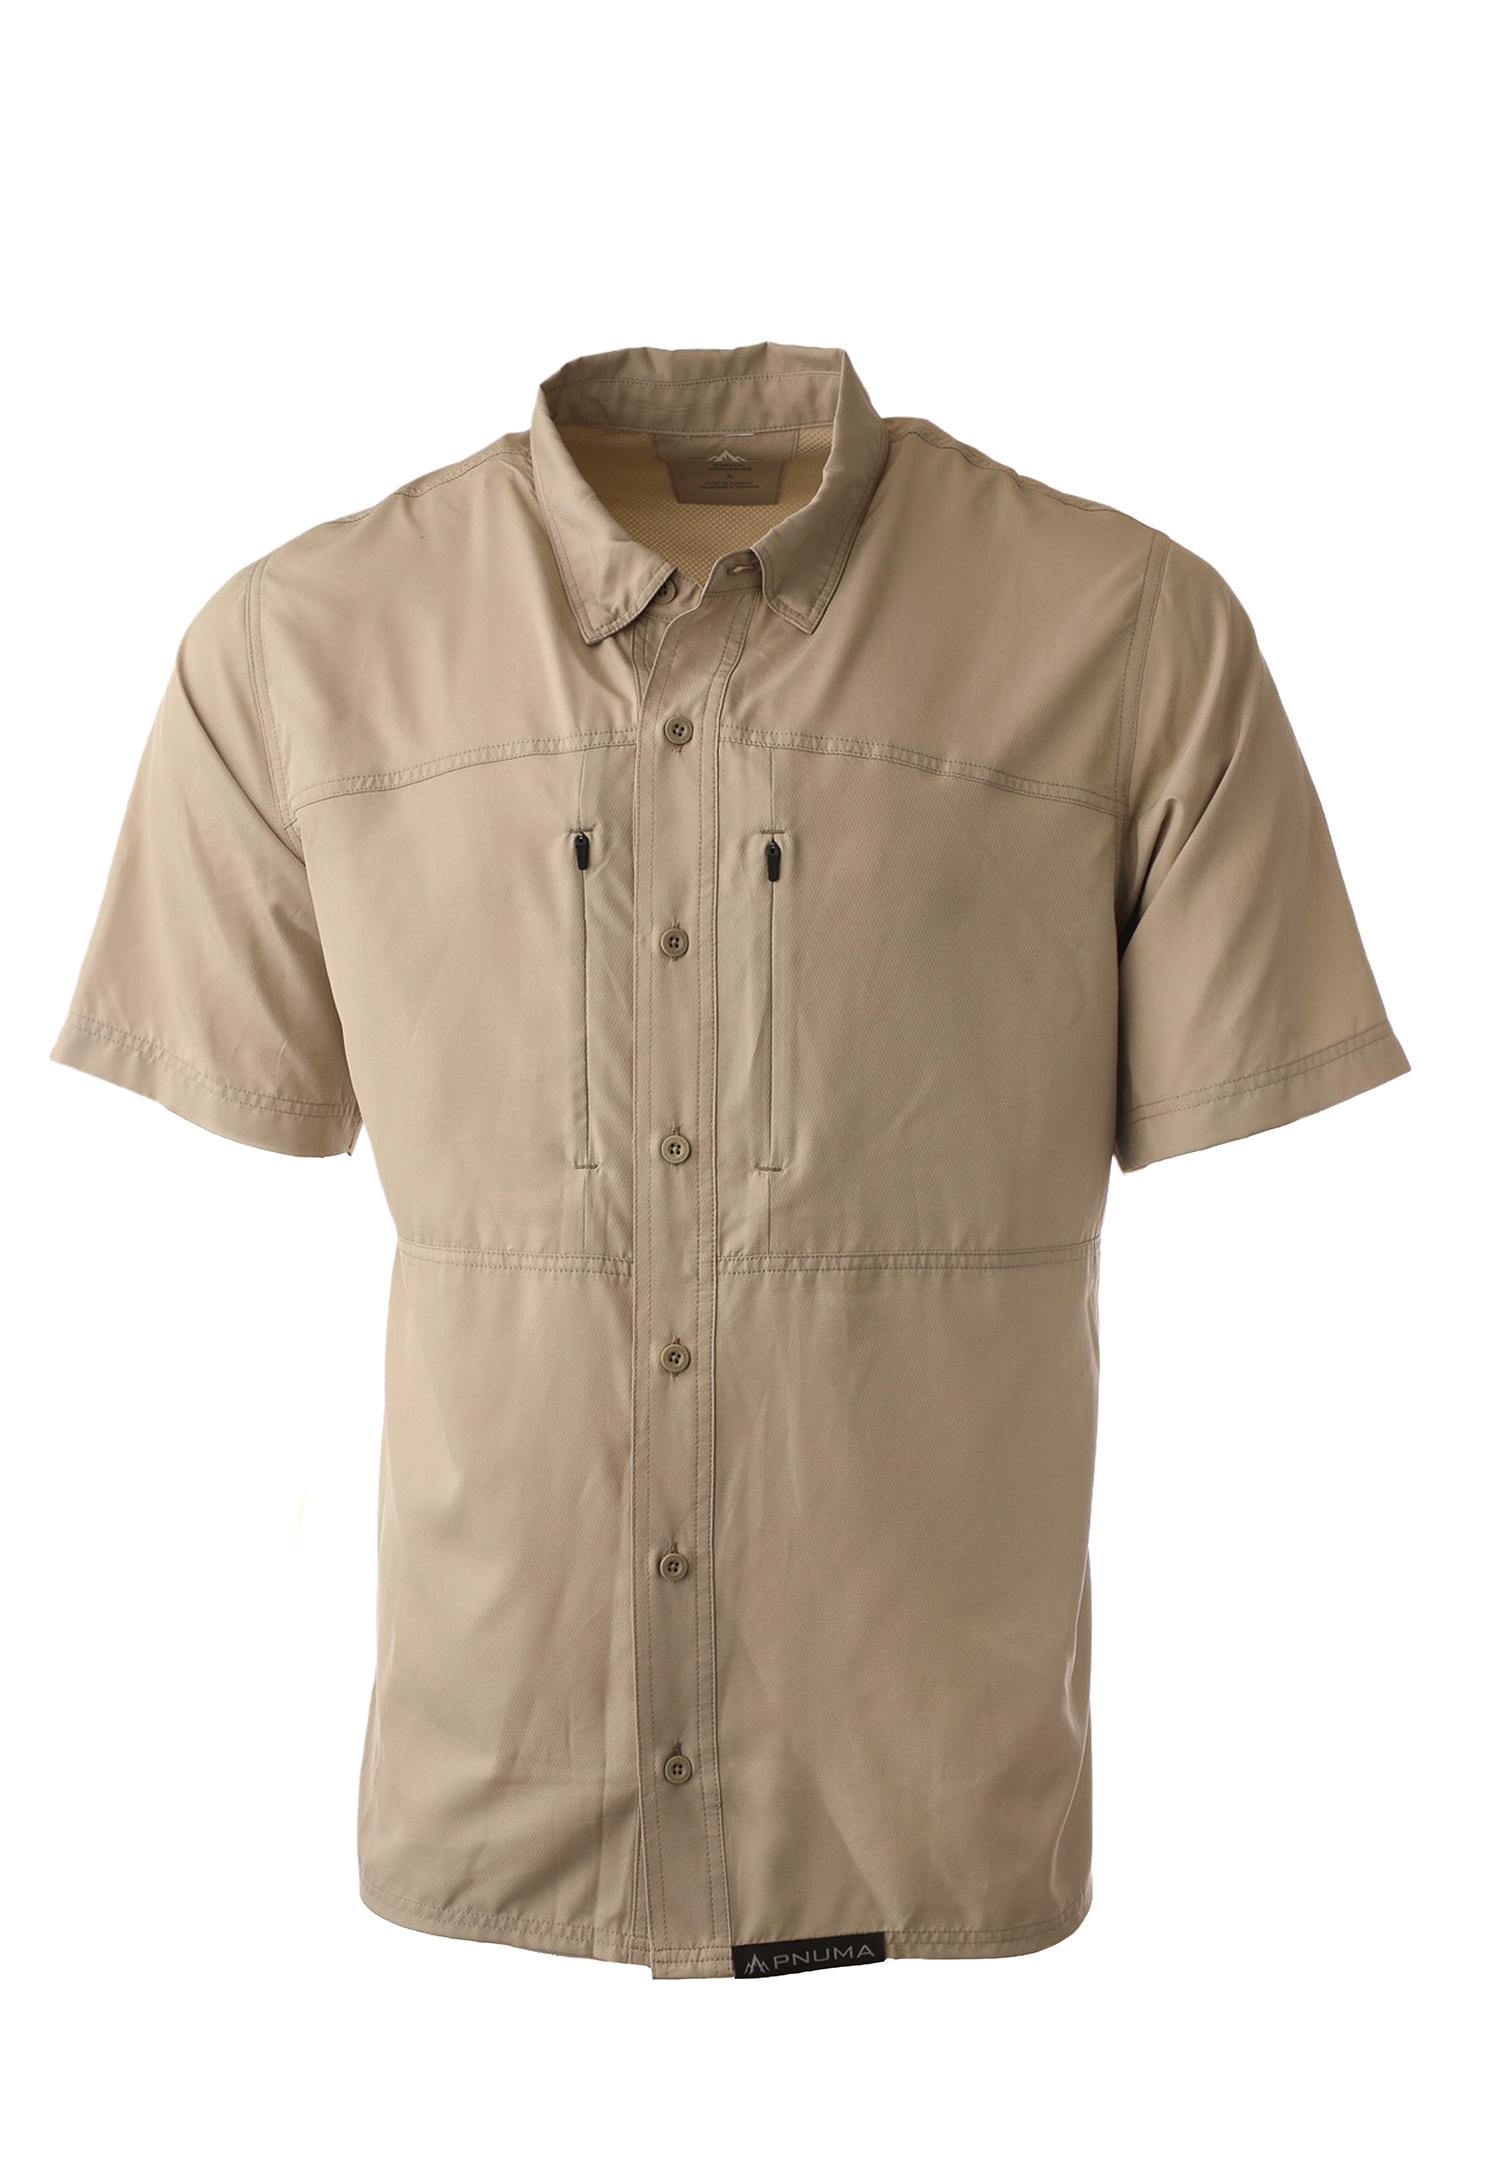 Shooting Shirt - Short Sleeve - Solid